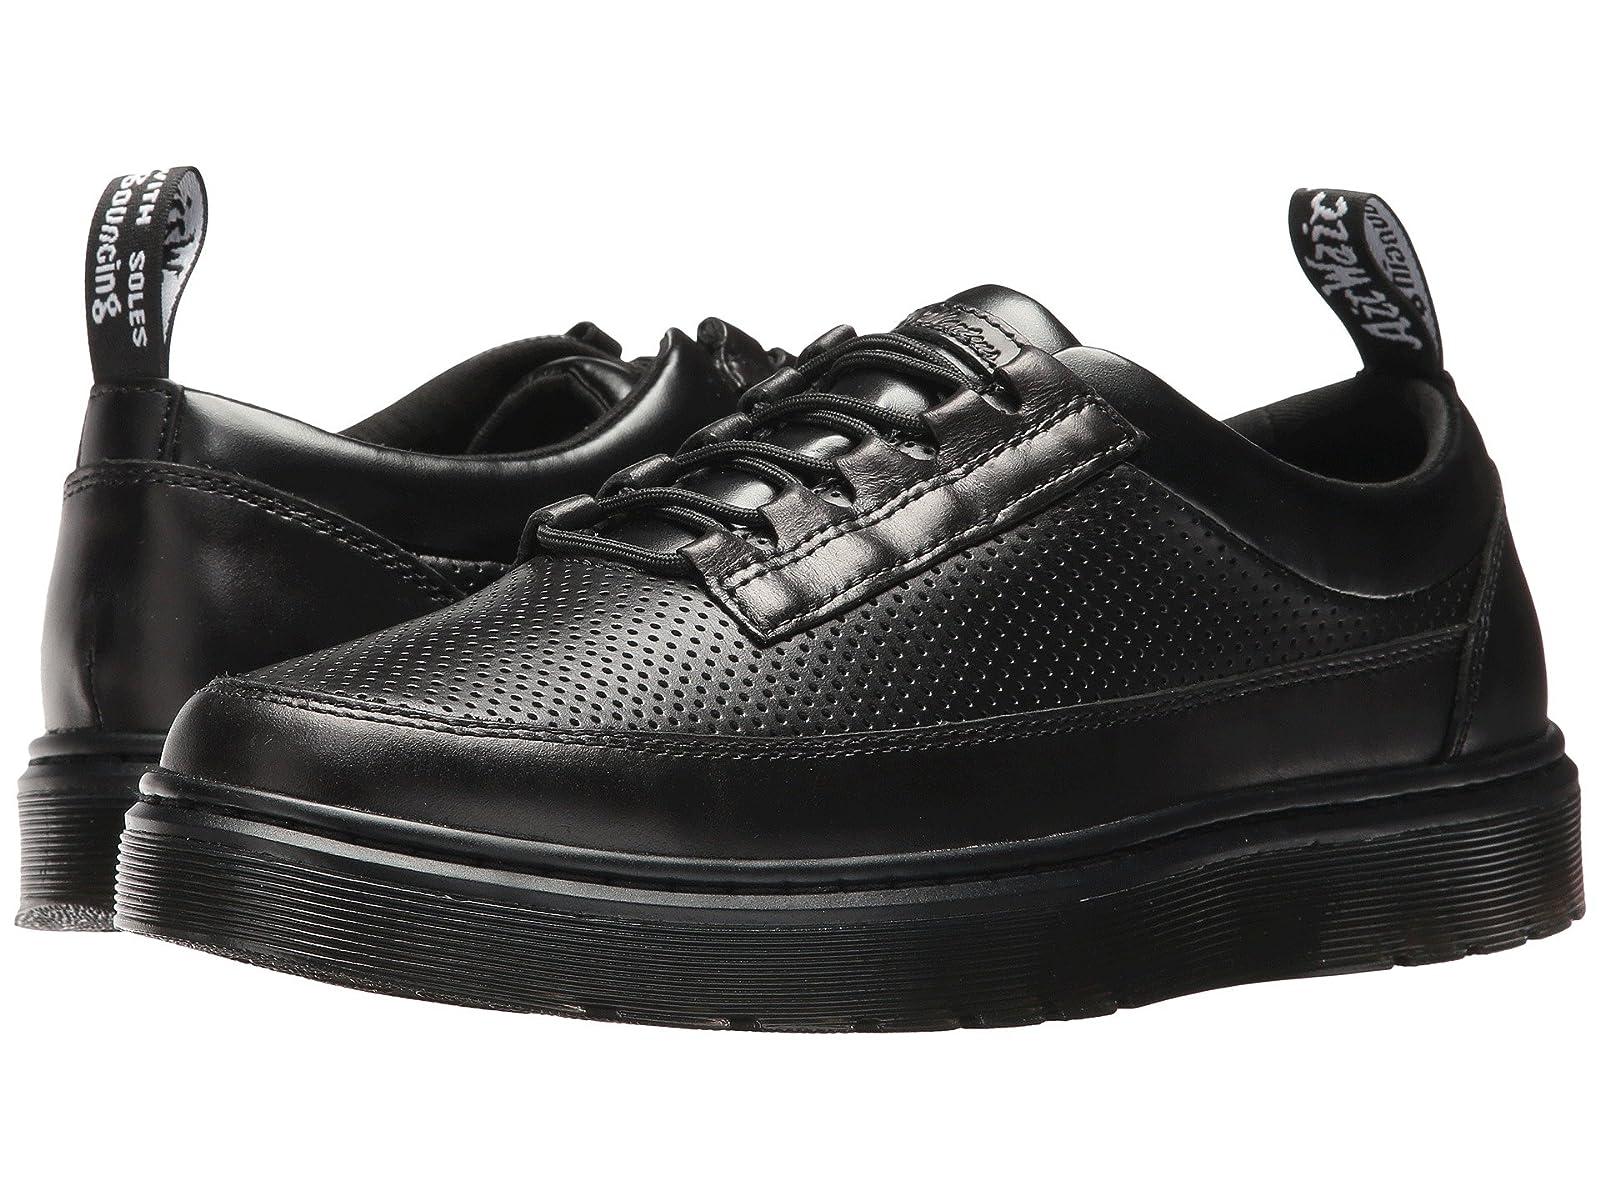 Dr. Martens Reuban Brando PerfedCheap and distinctive eye-catching shoes